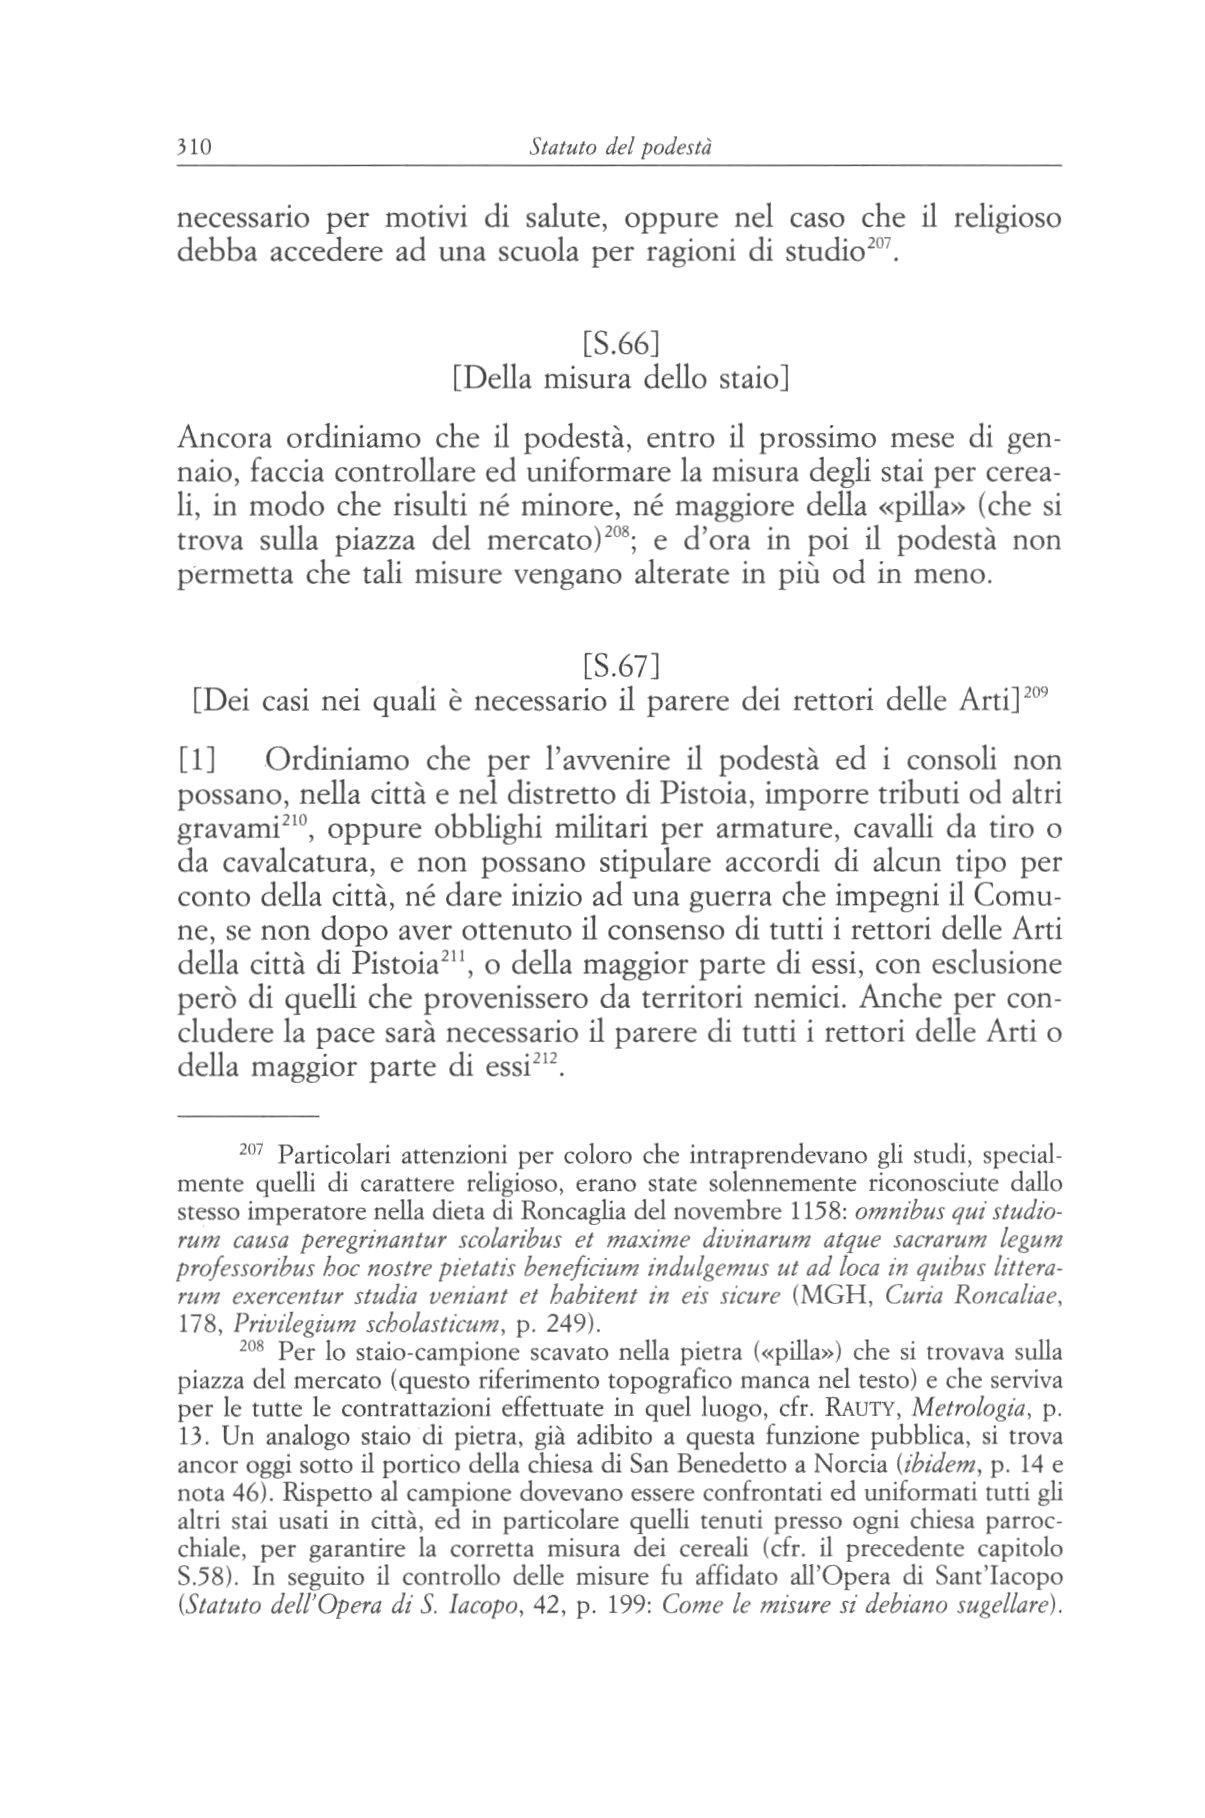 statuti pistoiesi del sec.XII 0310.jpg